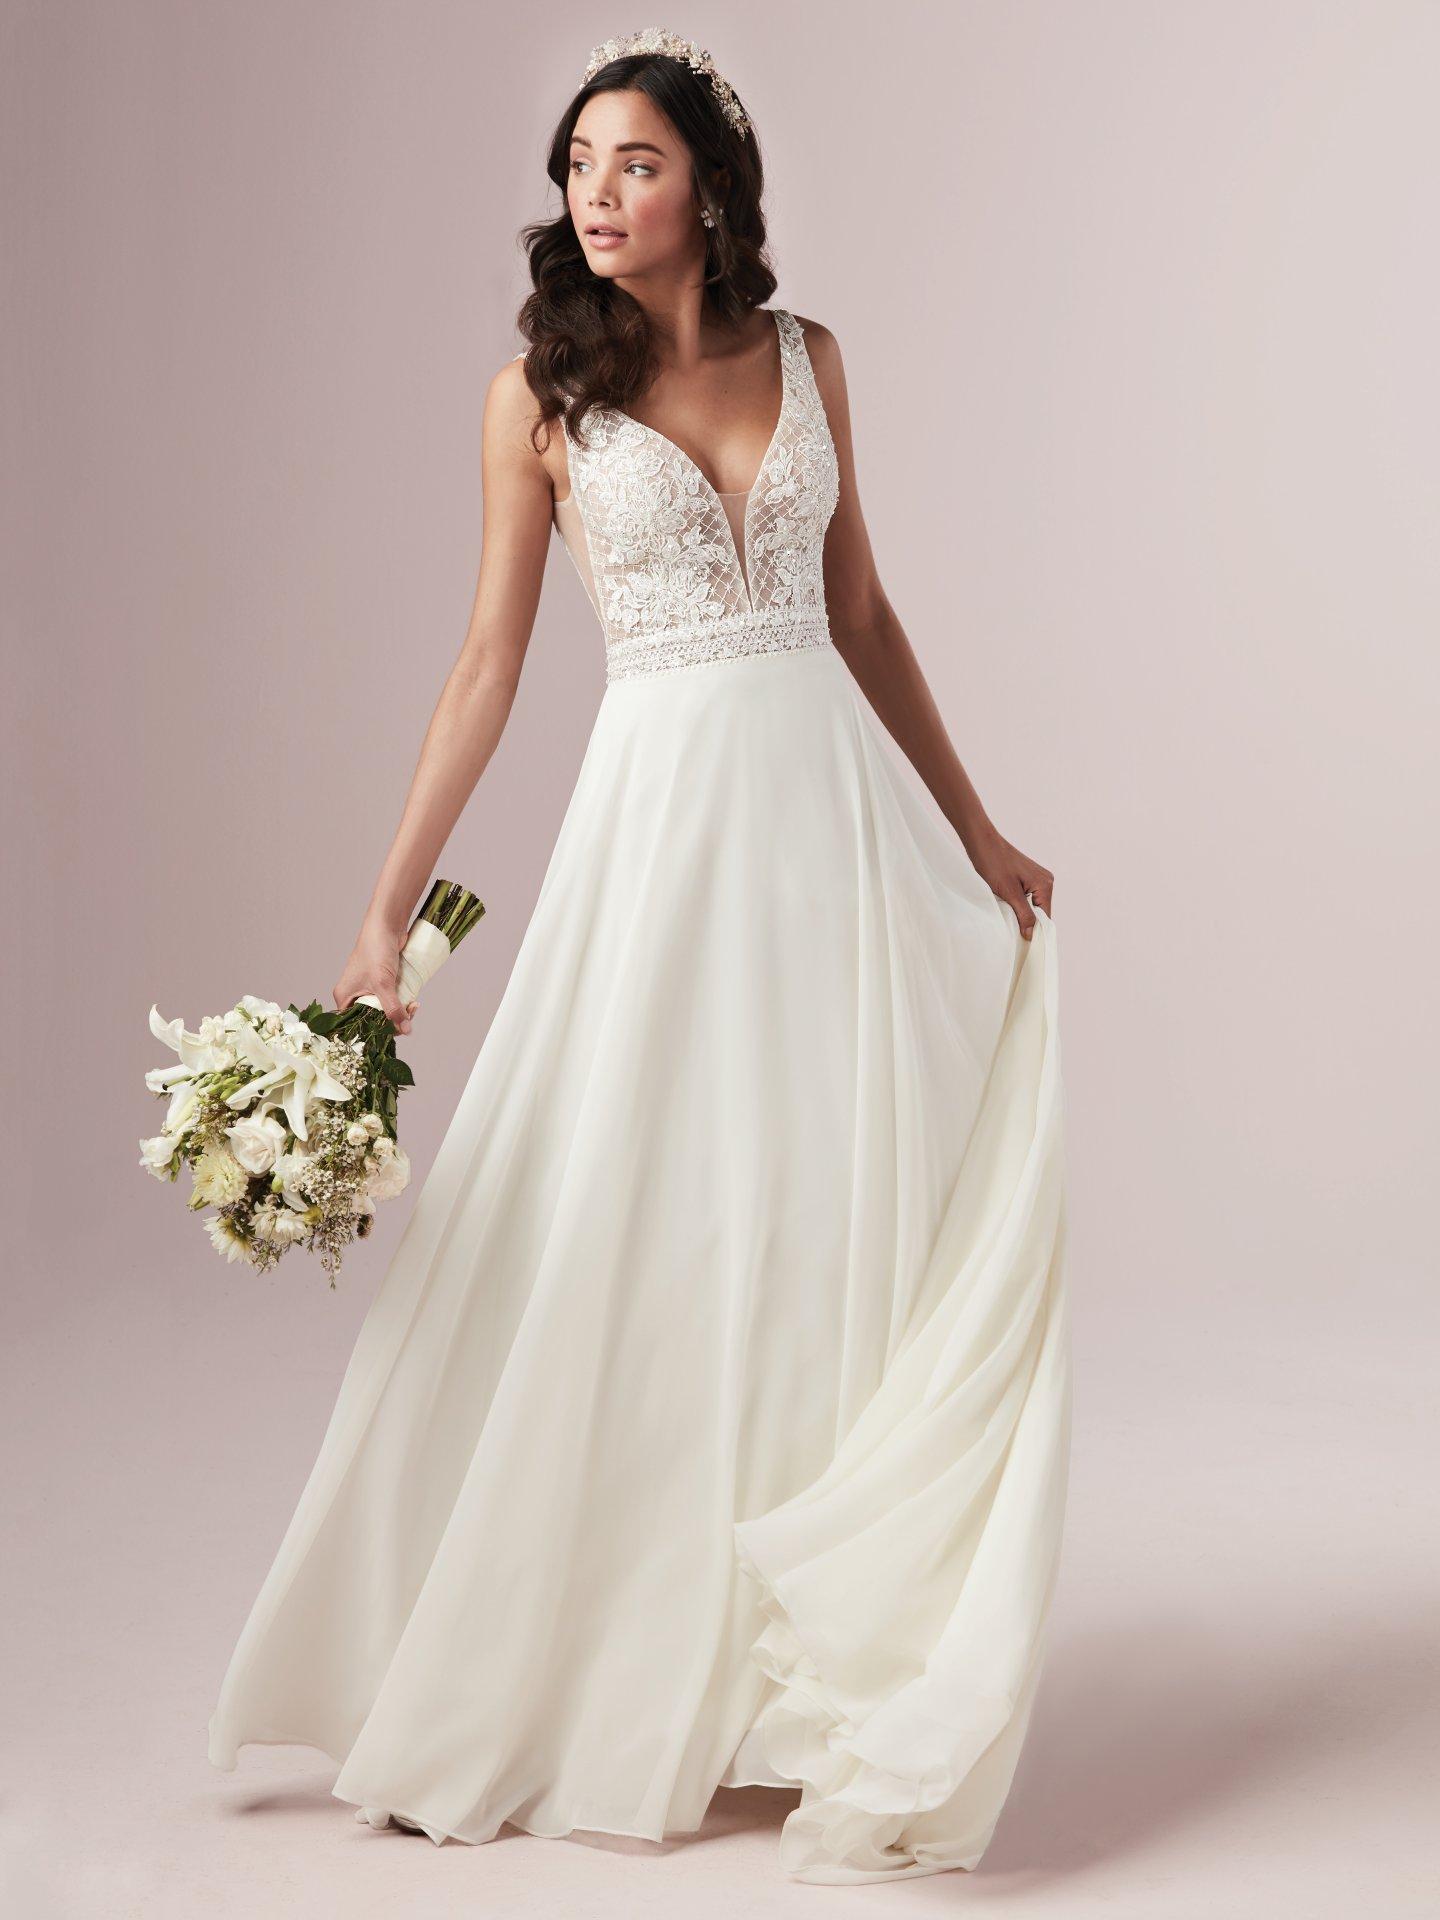 Mildred by Rebecca Ingram Chiffon Boho Wedding Dress